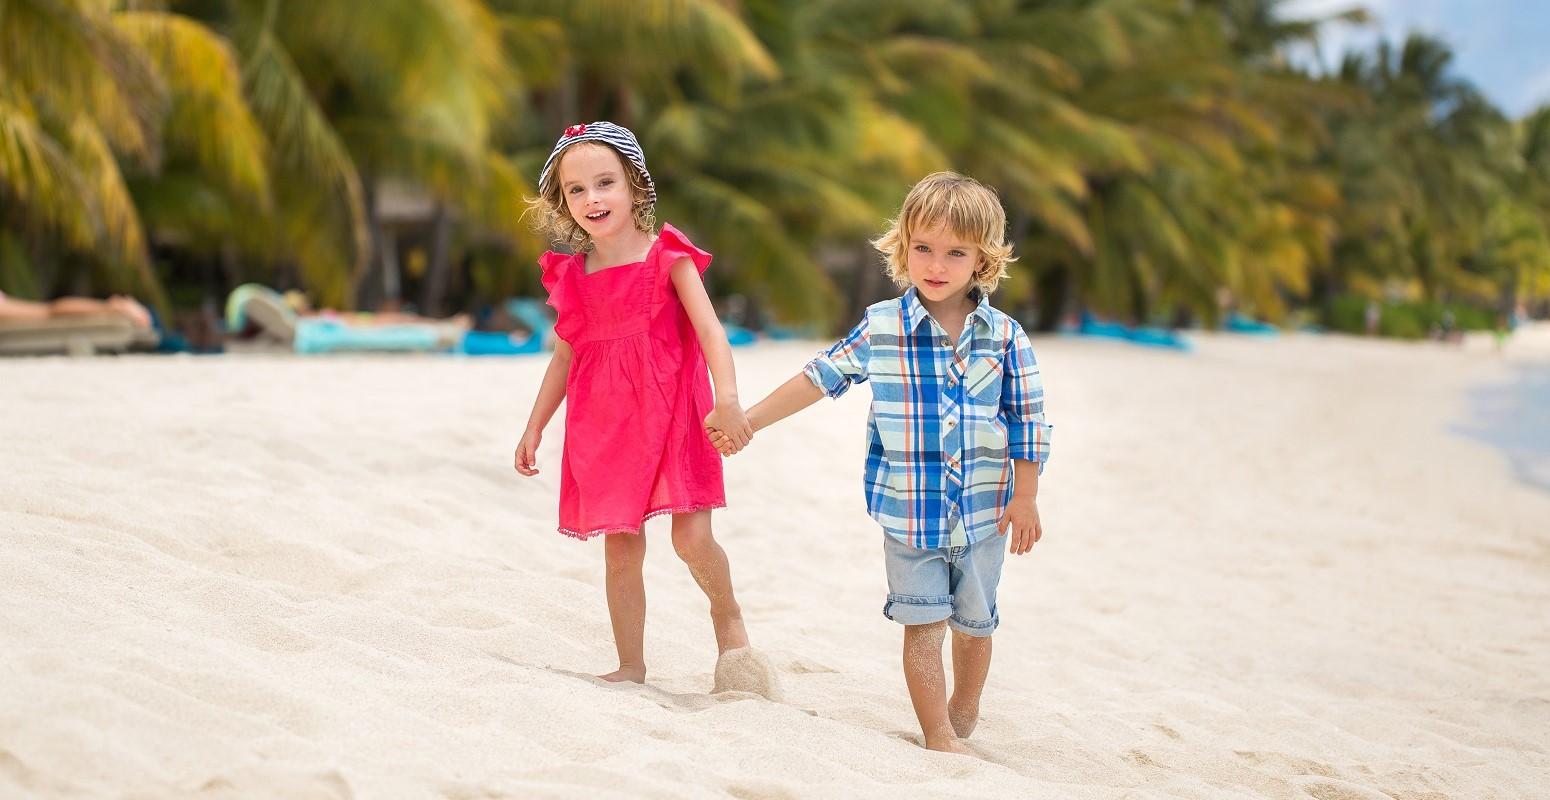 paseando playa caribe viajacontuhijo